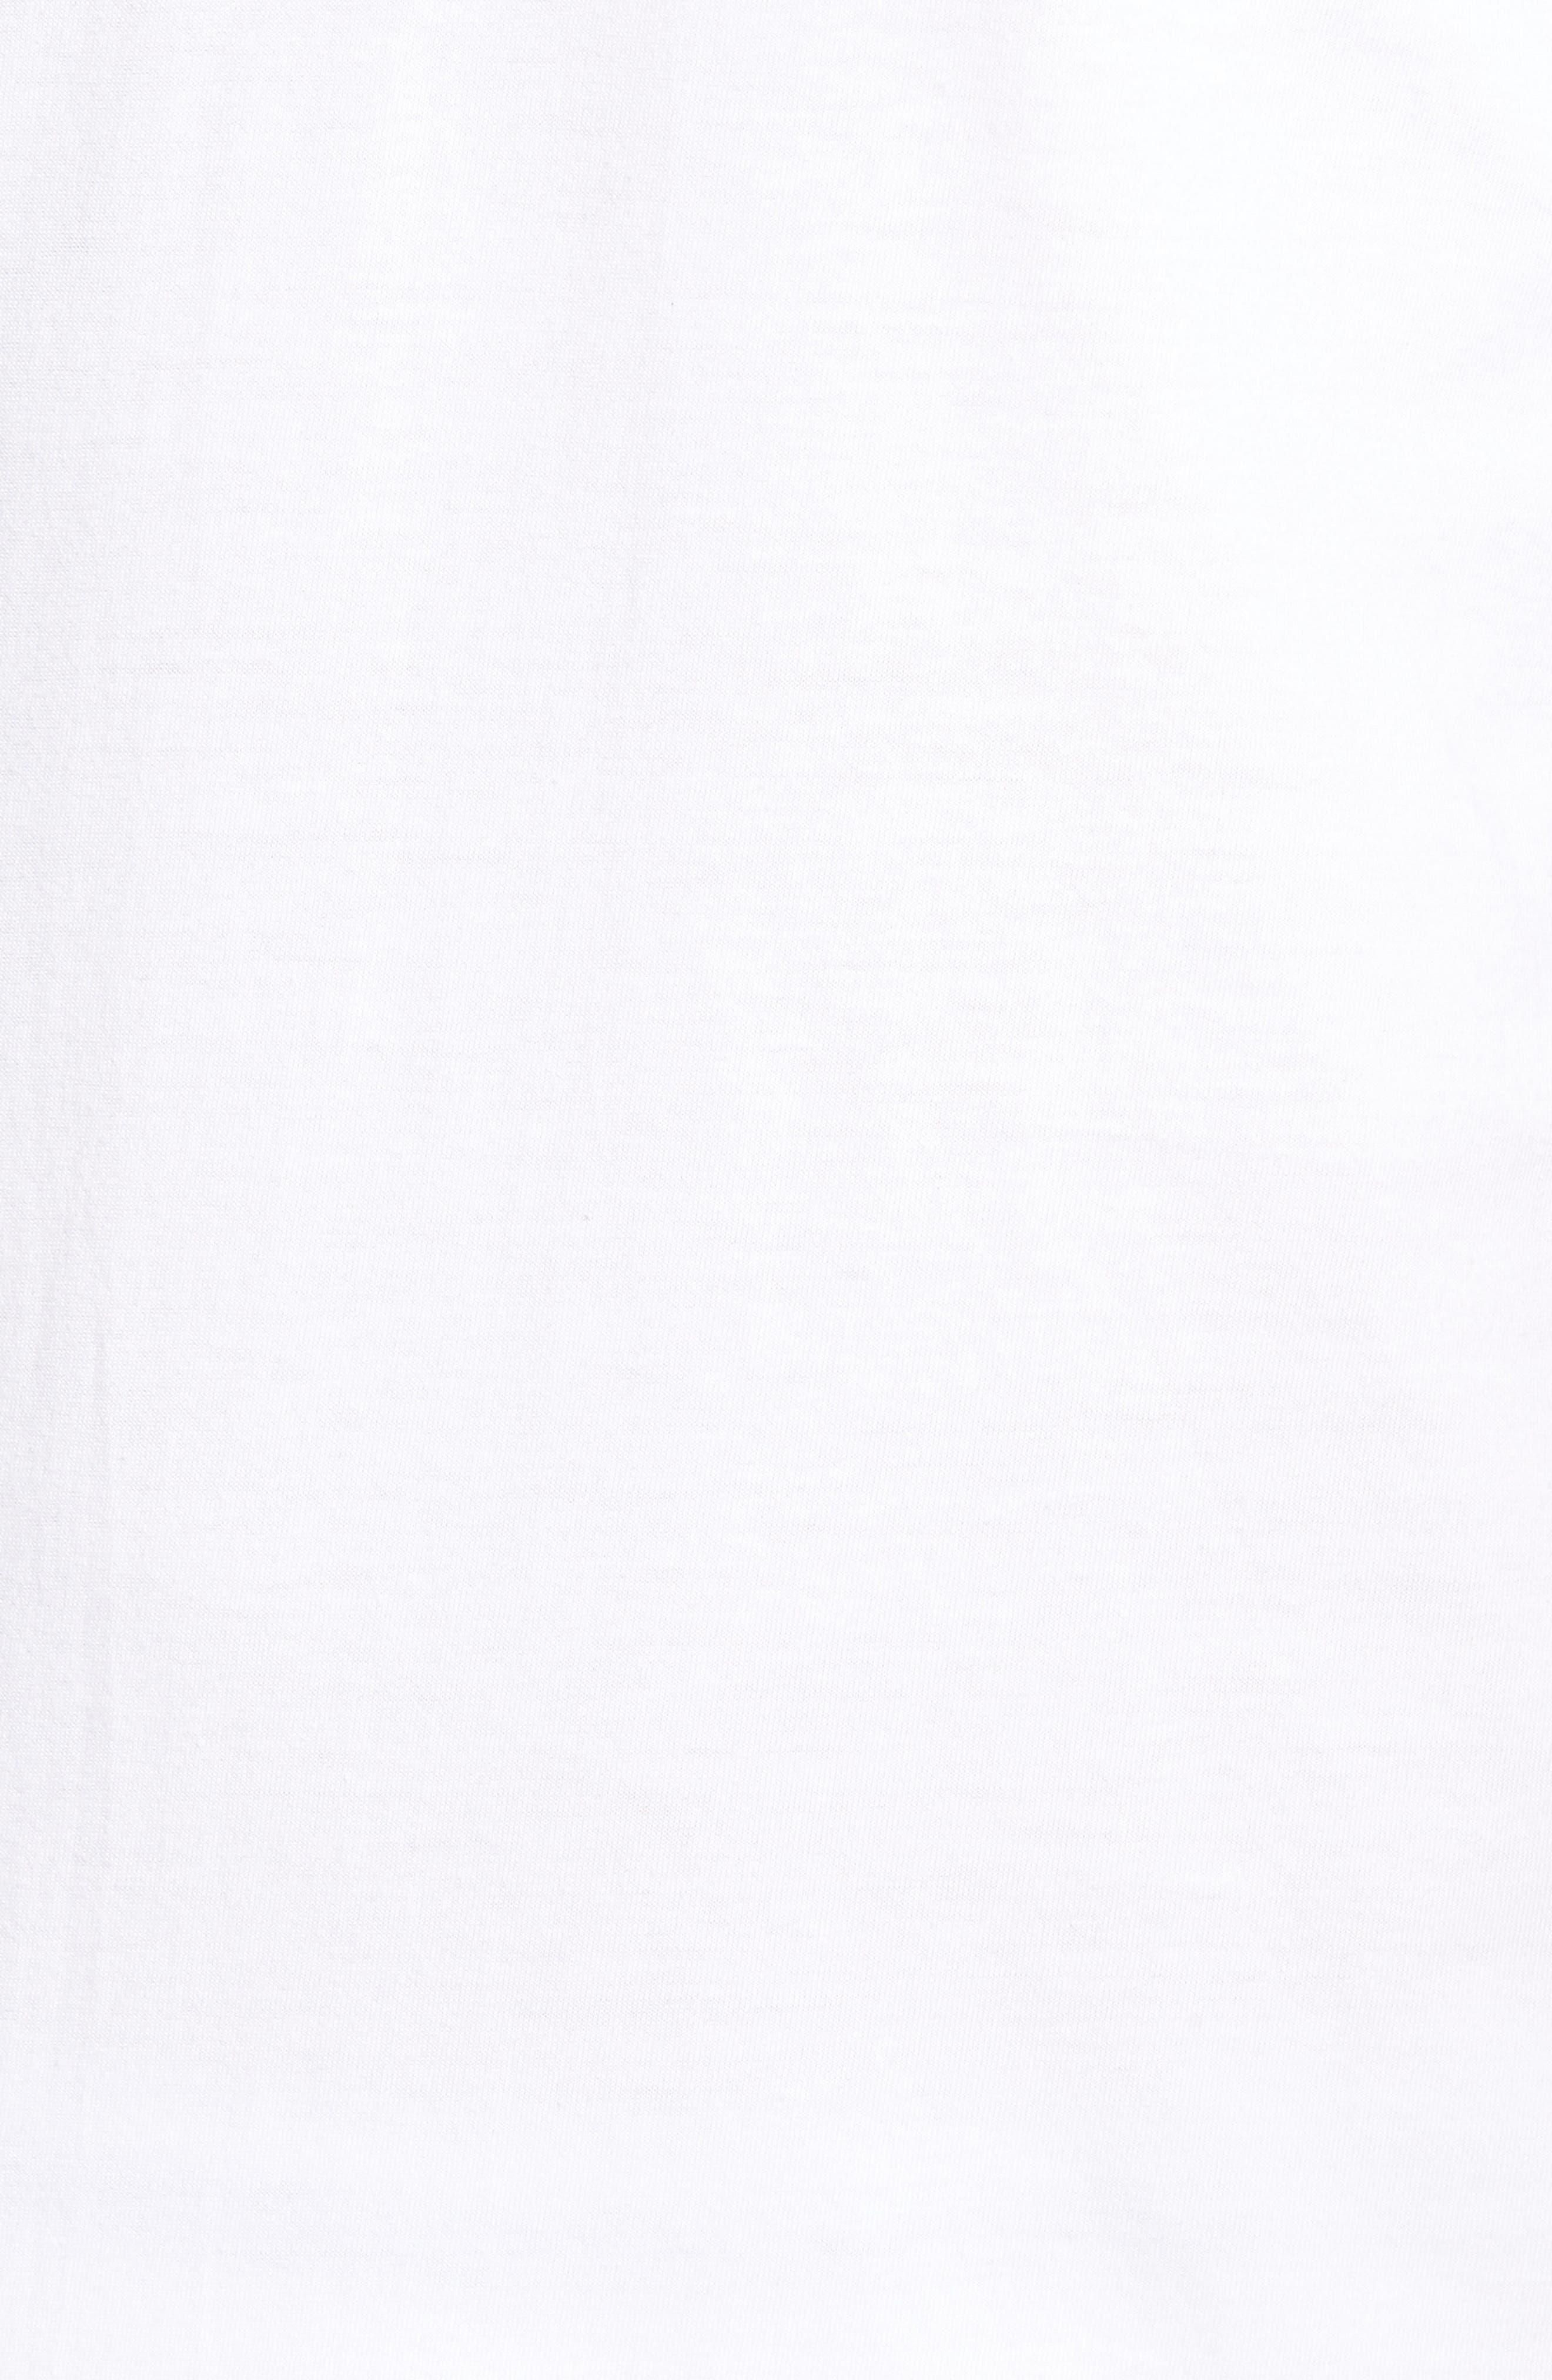 NORDSTROM MEN'S SHOP, 4-Pack Regular Fit Supima<sup>®</sup> Cotton V-Neck T-Shirts, Alternate thumbnail 5, color, WHITE